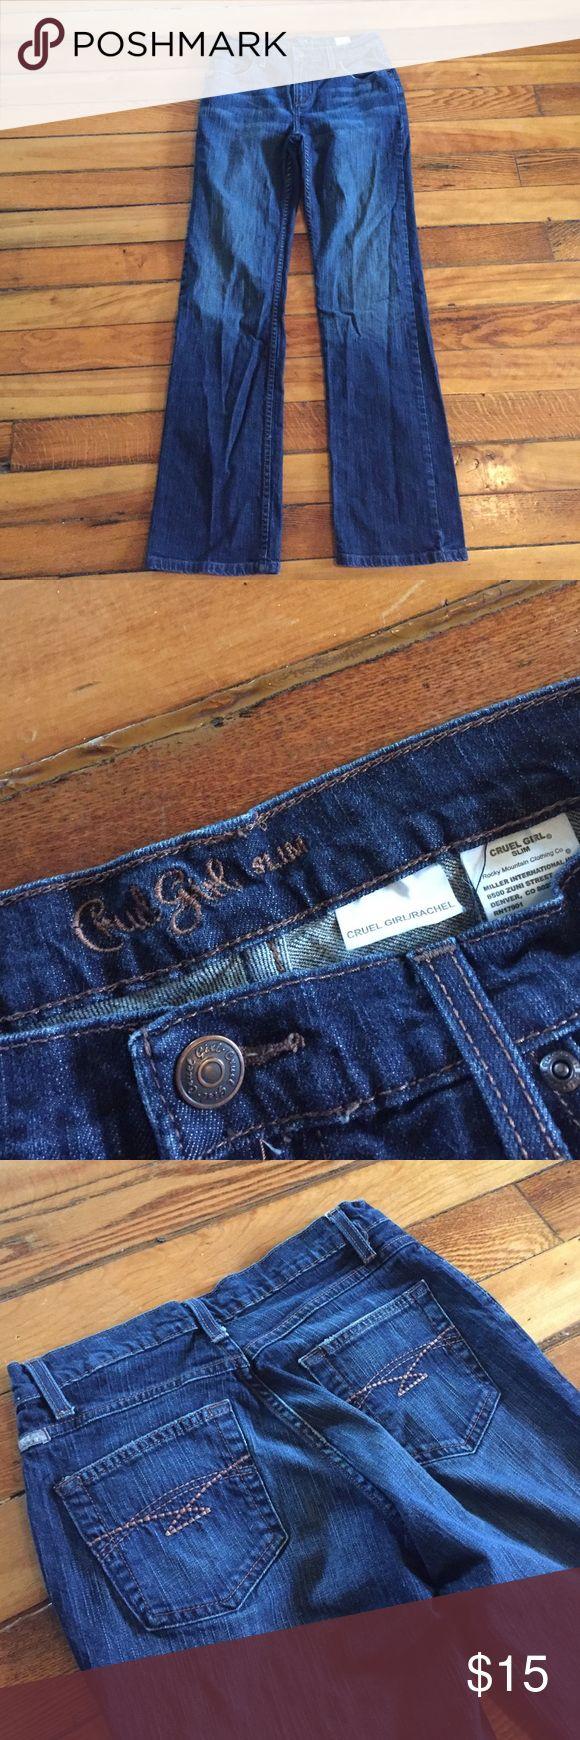 "Cruel Girl jeans, Rachel Slim, size 7 Regular These are the Rachel jeans by Cruel Girl, Slim fit. Size 7 Regular. Inseam is 31"". Cruel Girl Jeans"